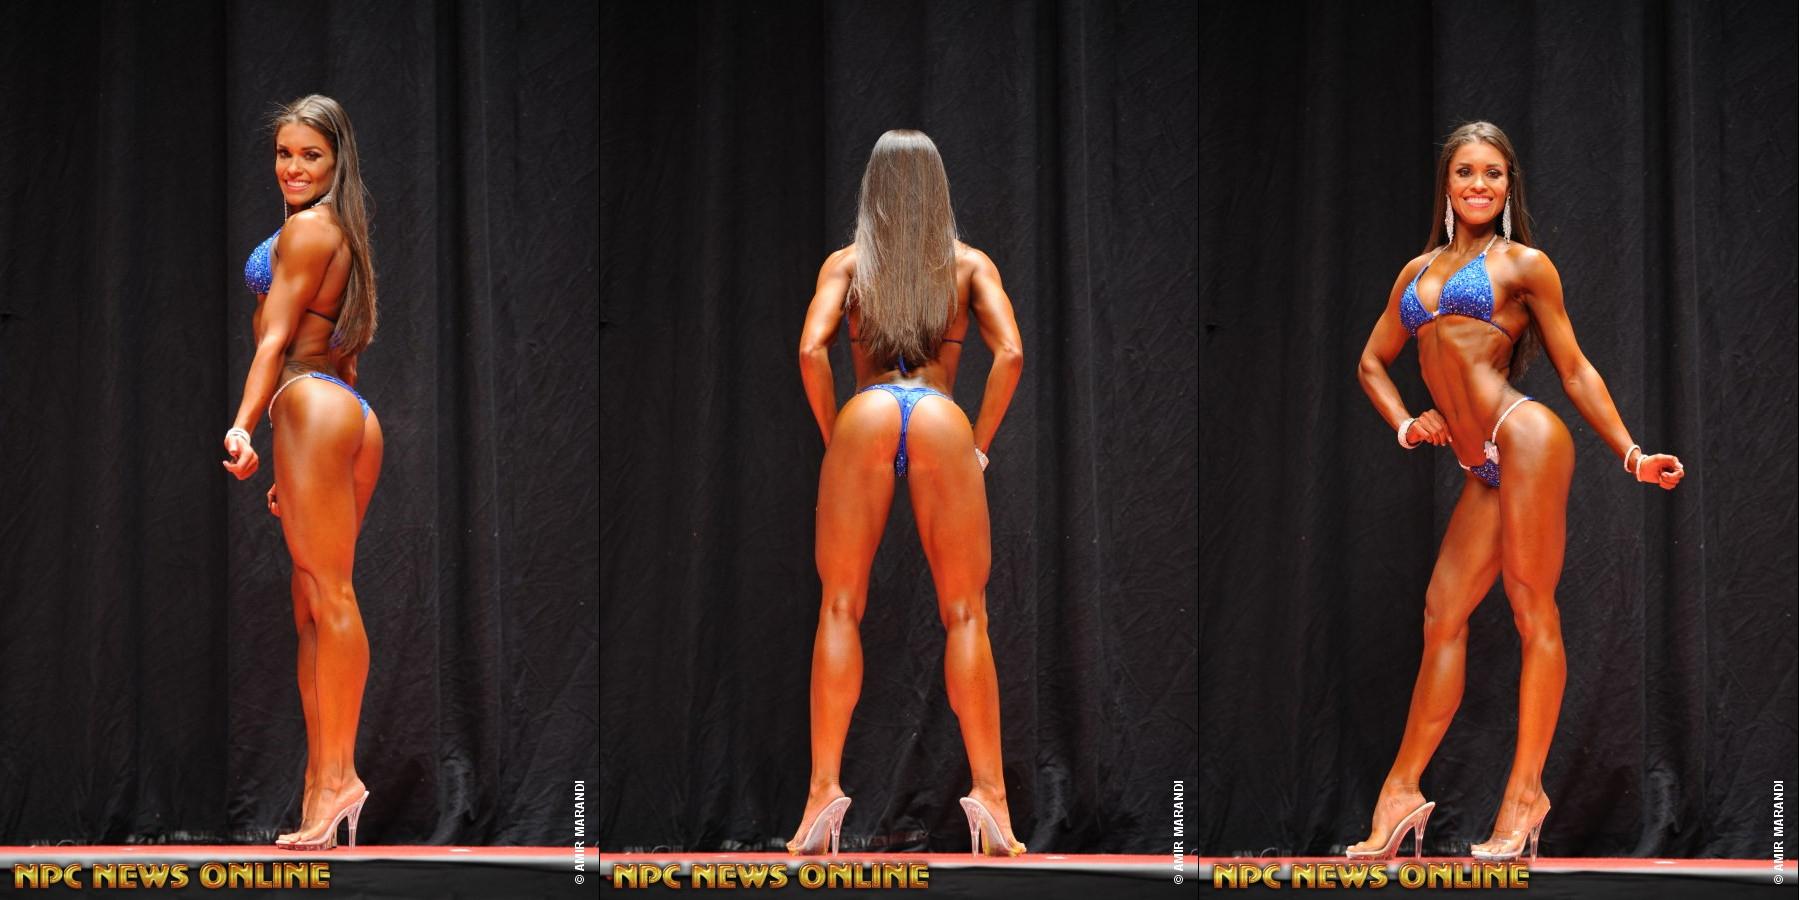 Nicole Grant / Николь Грант (Class B)